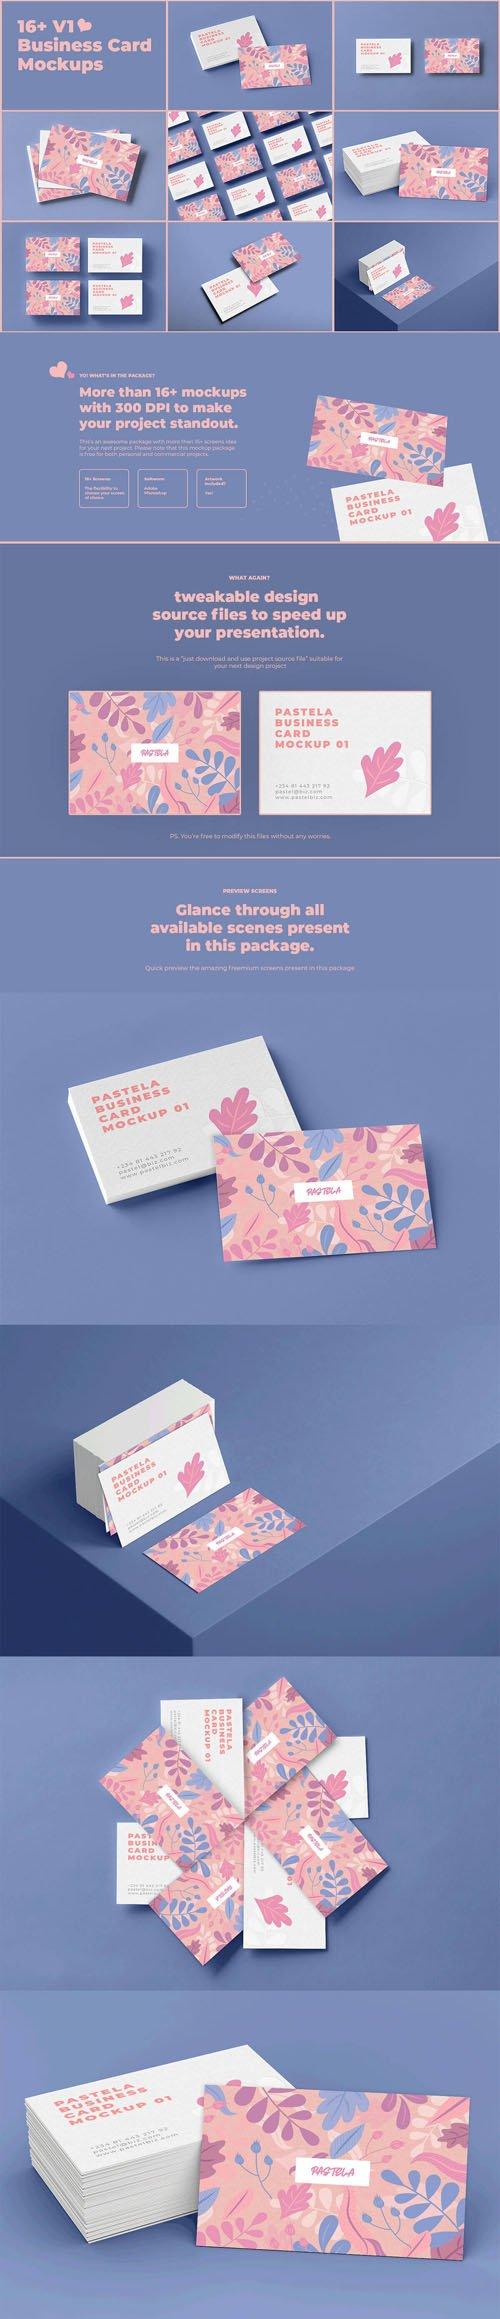 Business Card PSD Mockups Collection V1